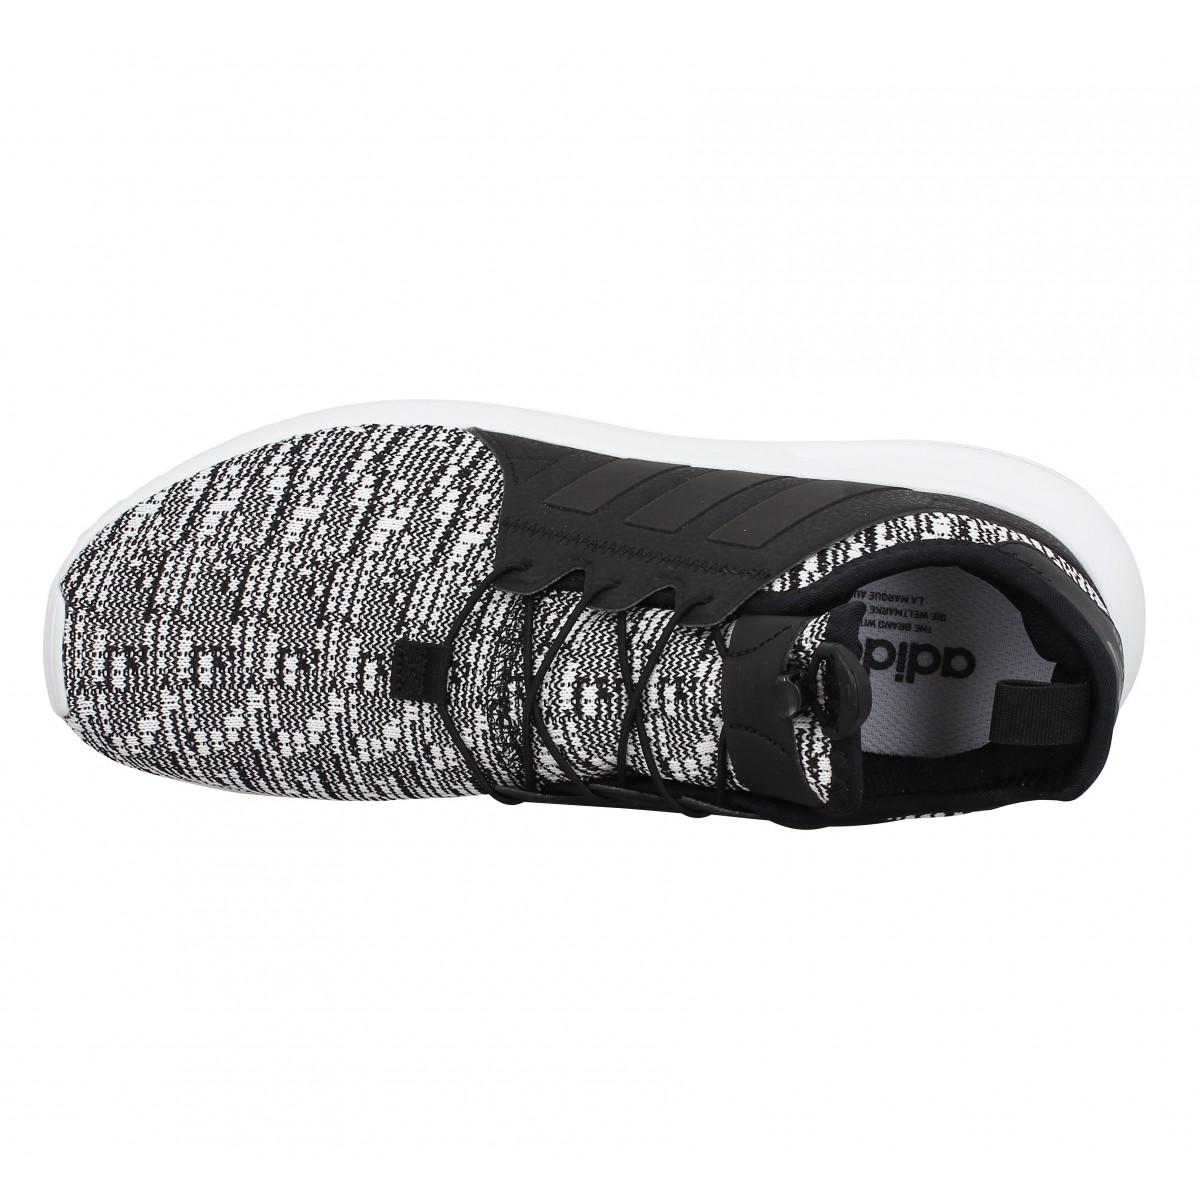 Adidas Homme X Plr Chaussures Noir Toile BlancFanny WBoeErdQxC